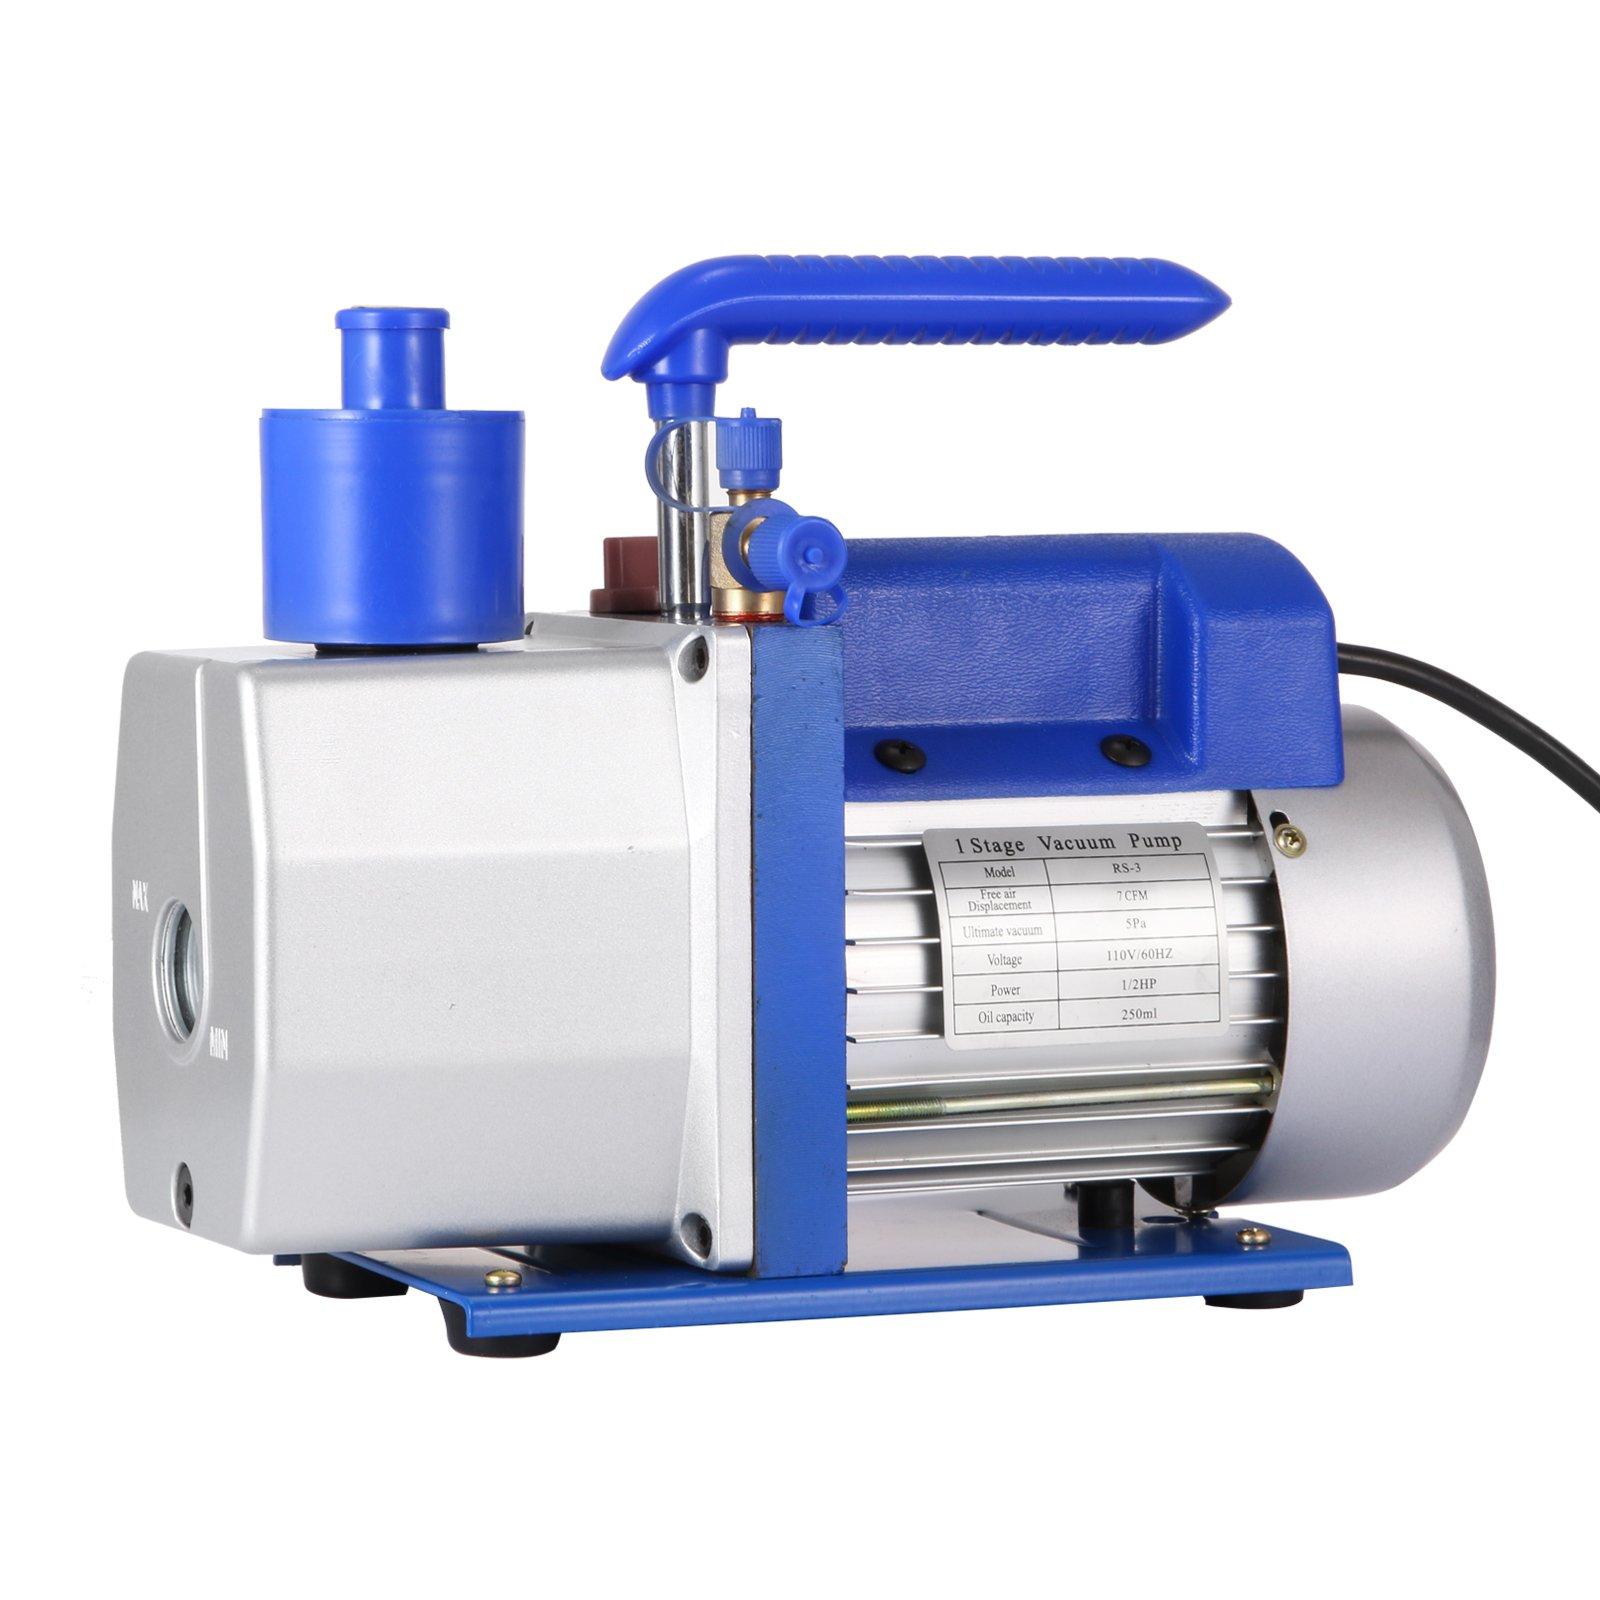 Mophorn Vacuum Pump HVAC 7 CFM 1/2HP Single Stage Vacuum Pump Refrigeration AC Air Conditioning Refrigerant Vacuum Evacuation Pump (7CFM, 1-Stage)